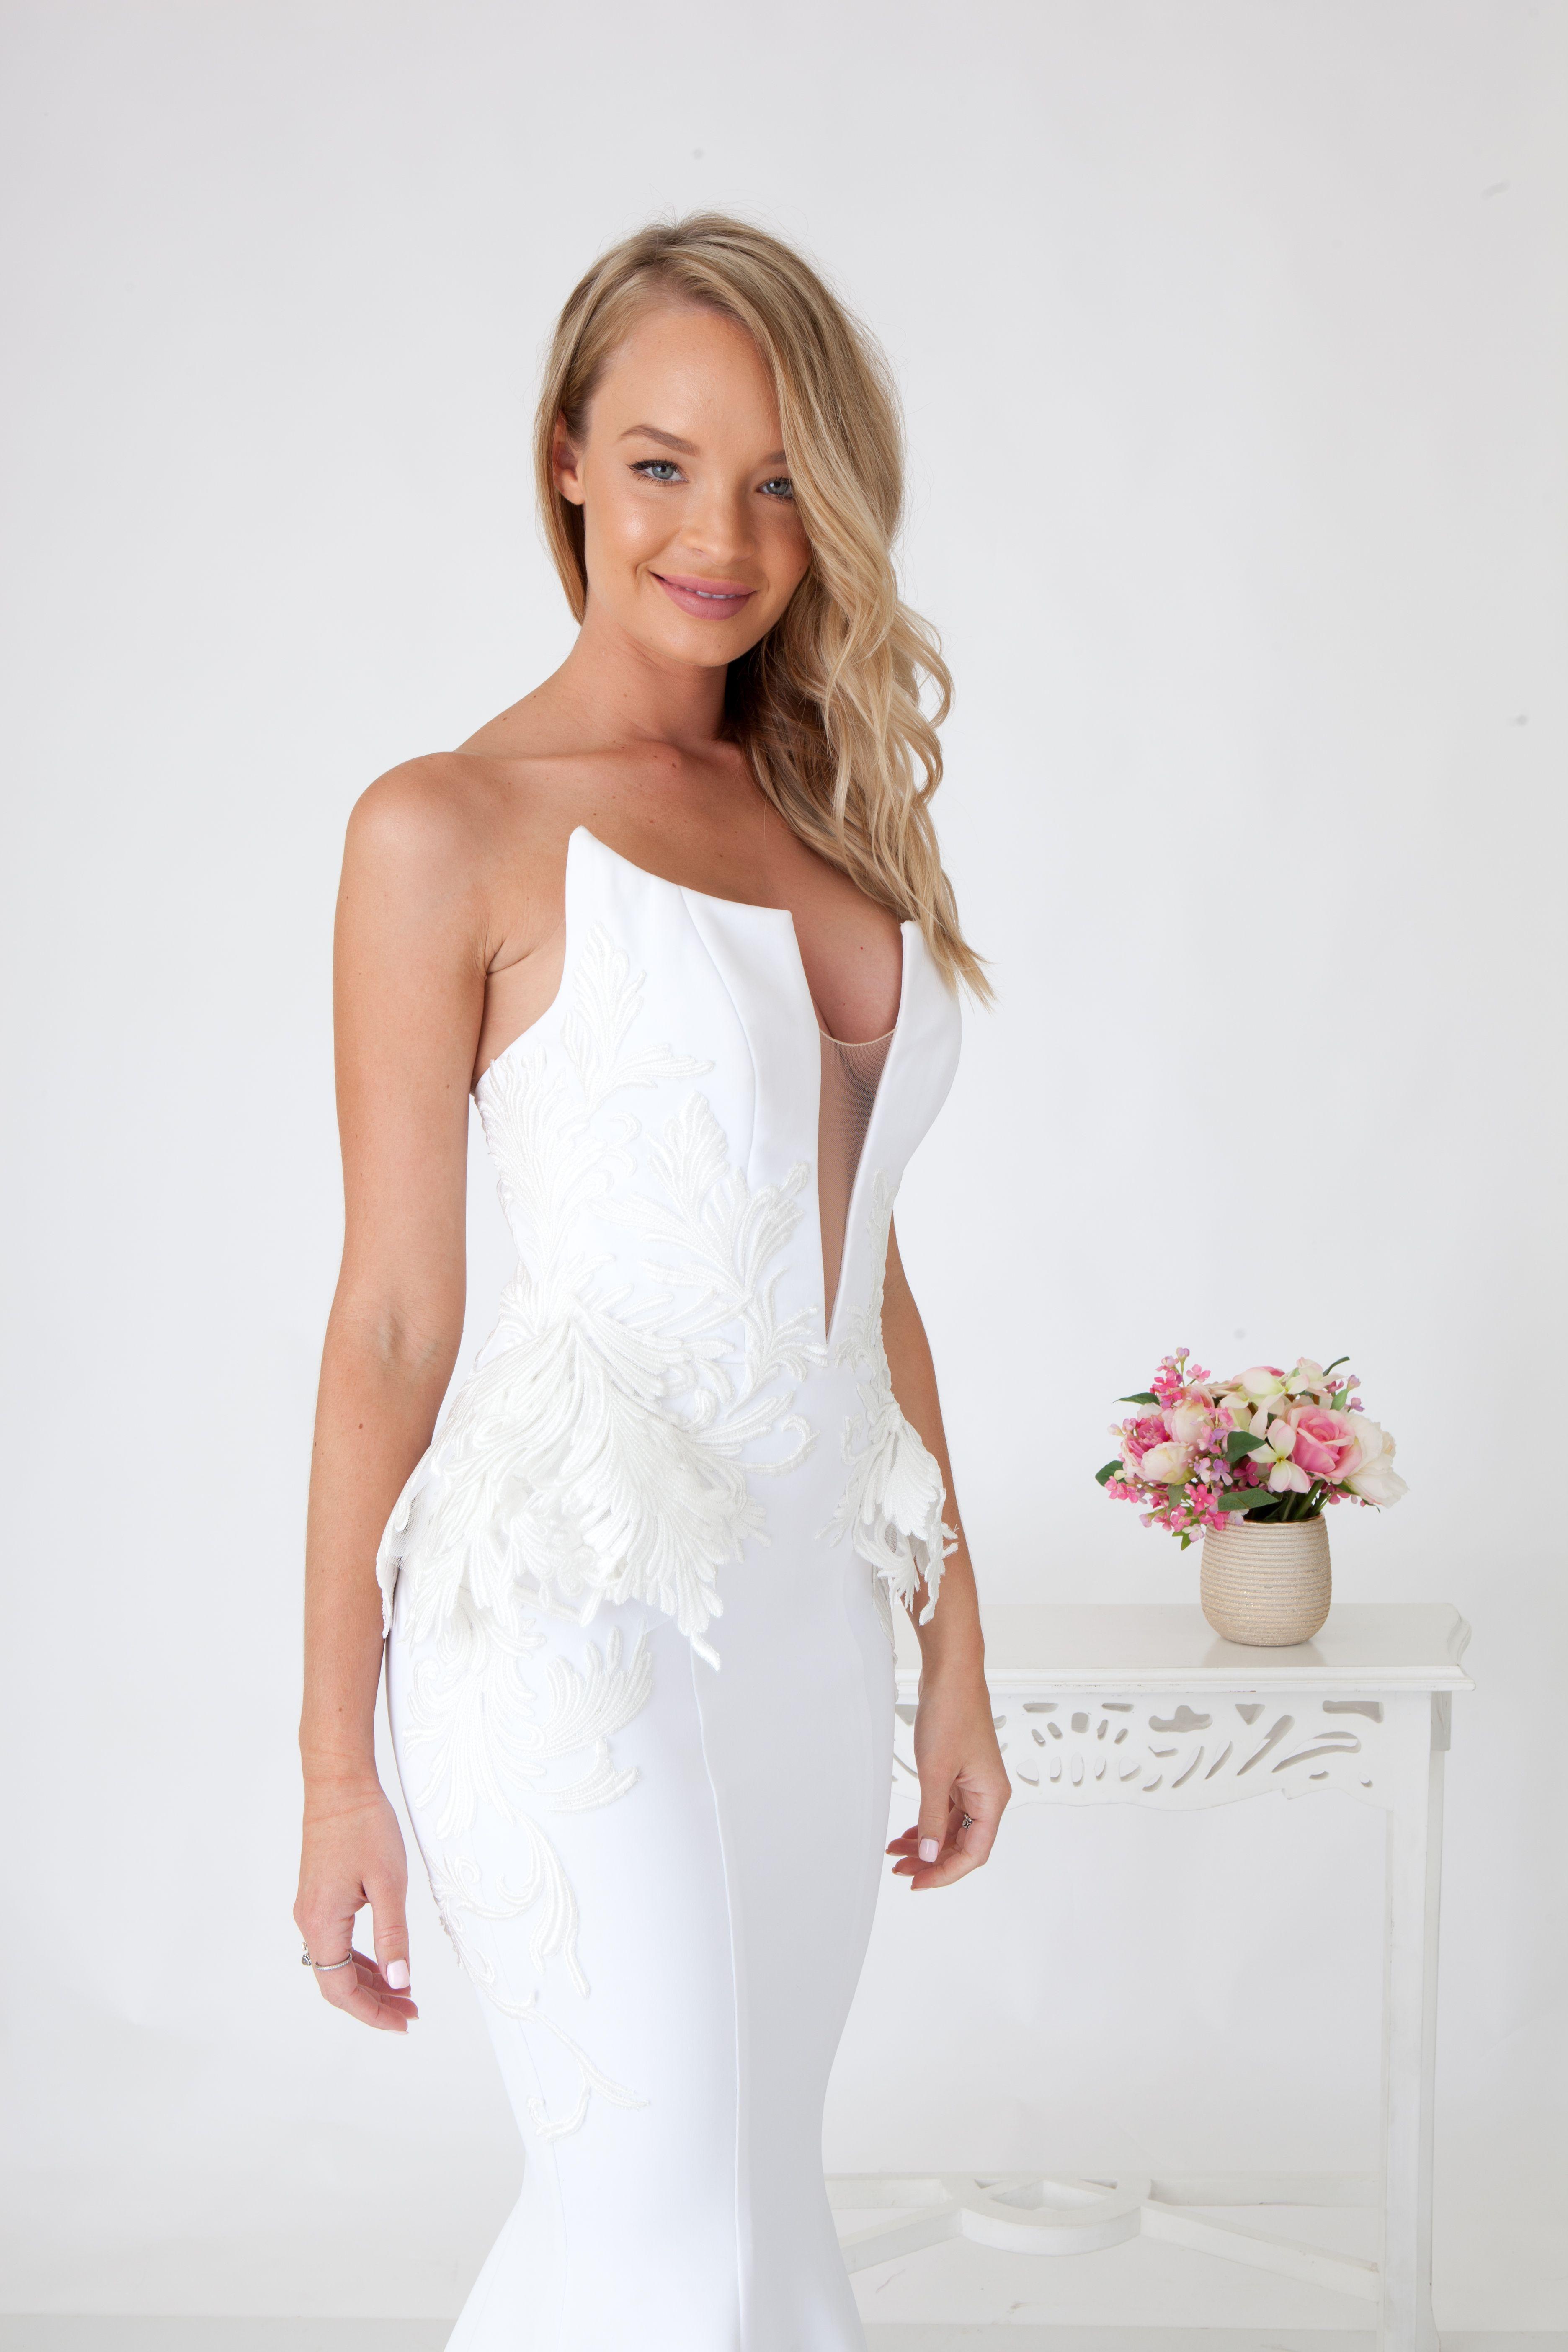 Brisbane wedding dress designers Euphorie Studios present